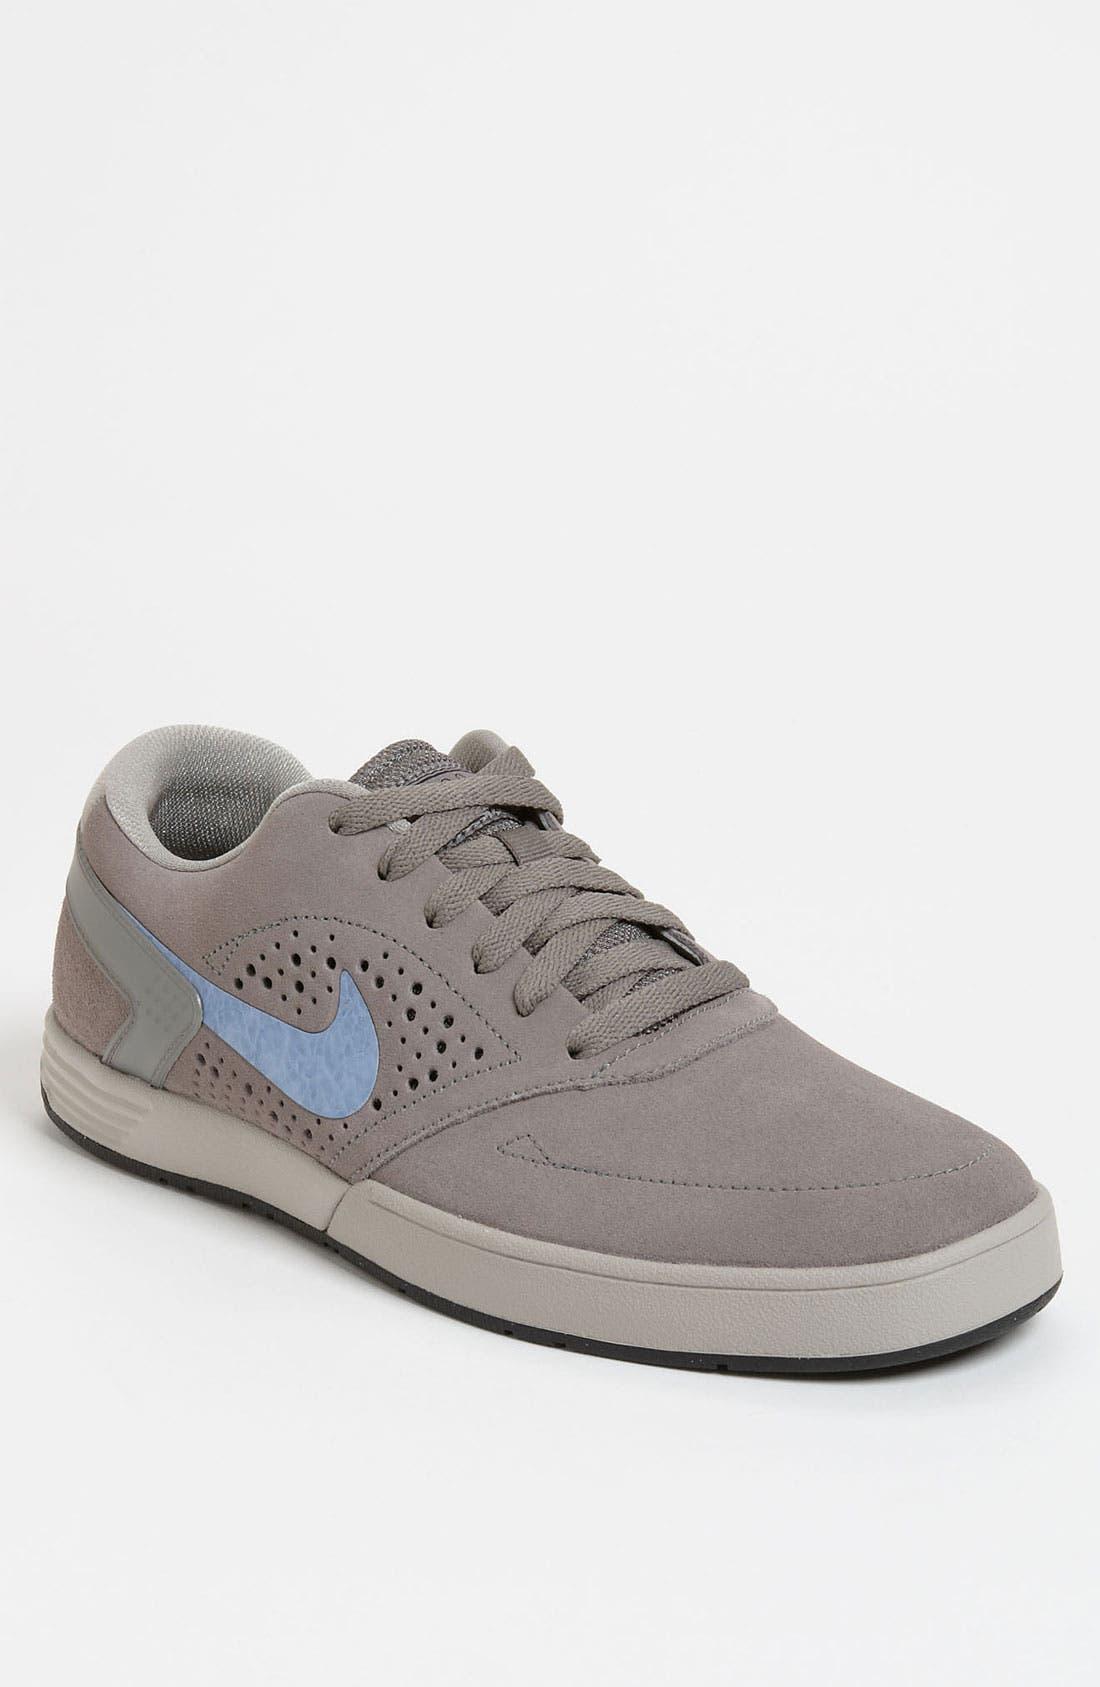 Alternate Image 1 Selected - Nike 'Paul Rodriguez 6' Sneaker (Men) (Online Only)